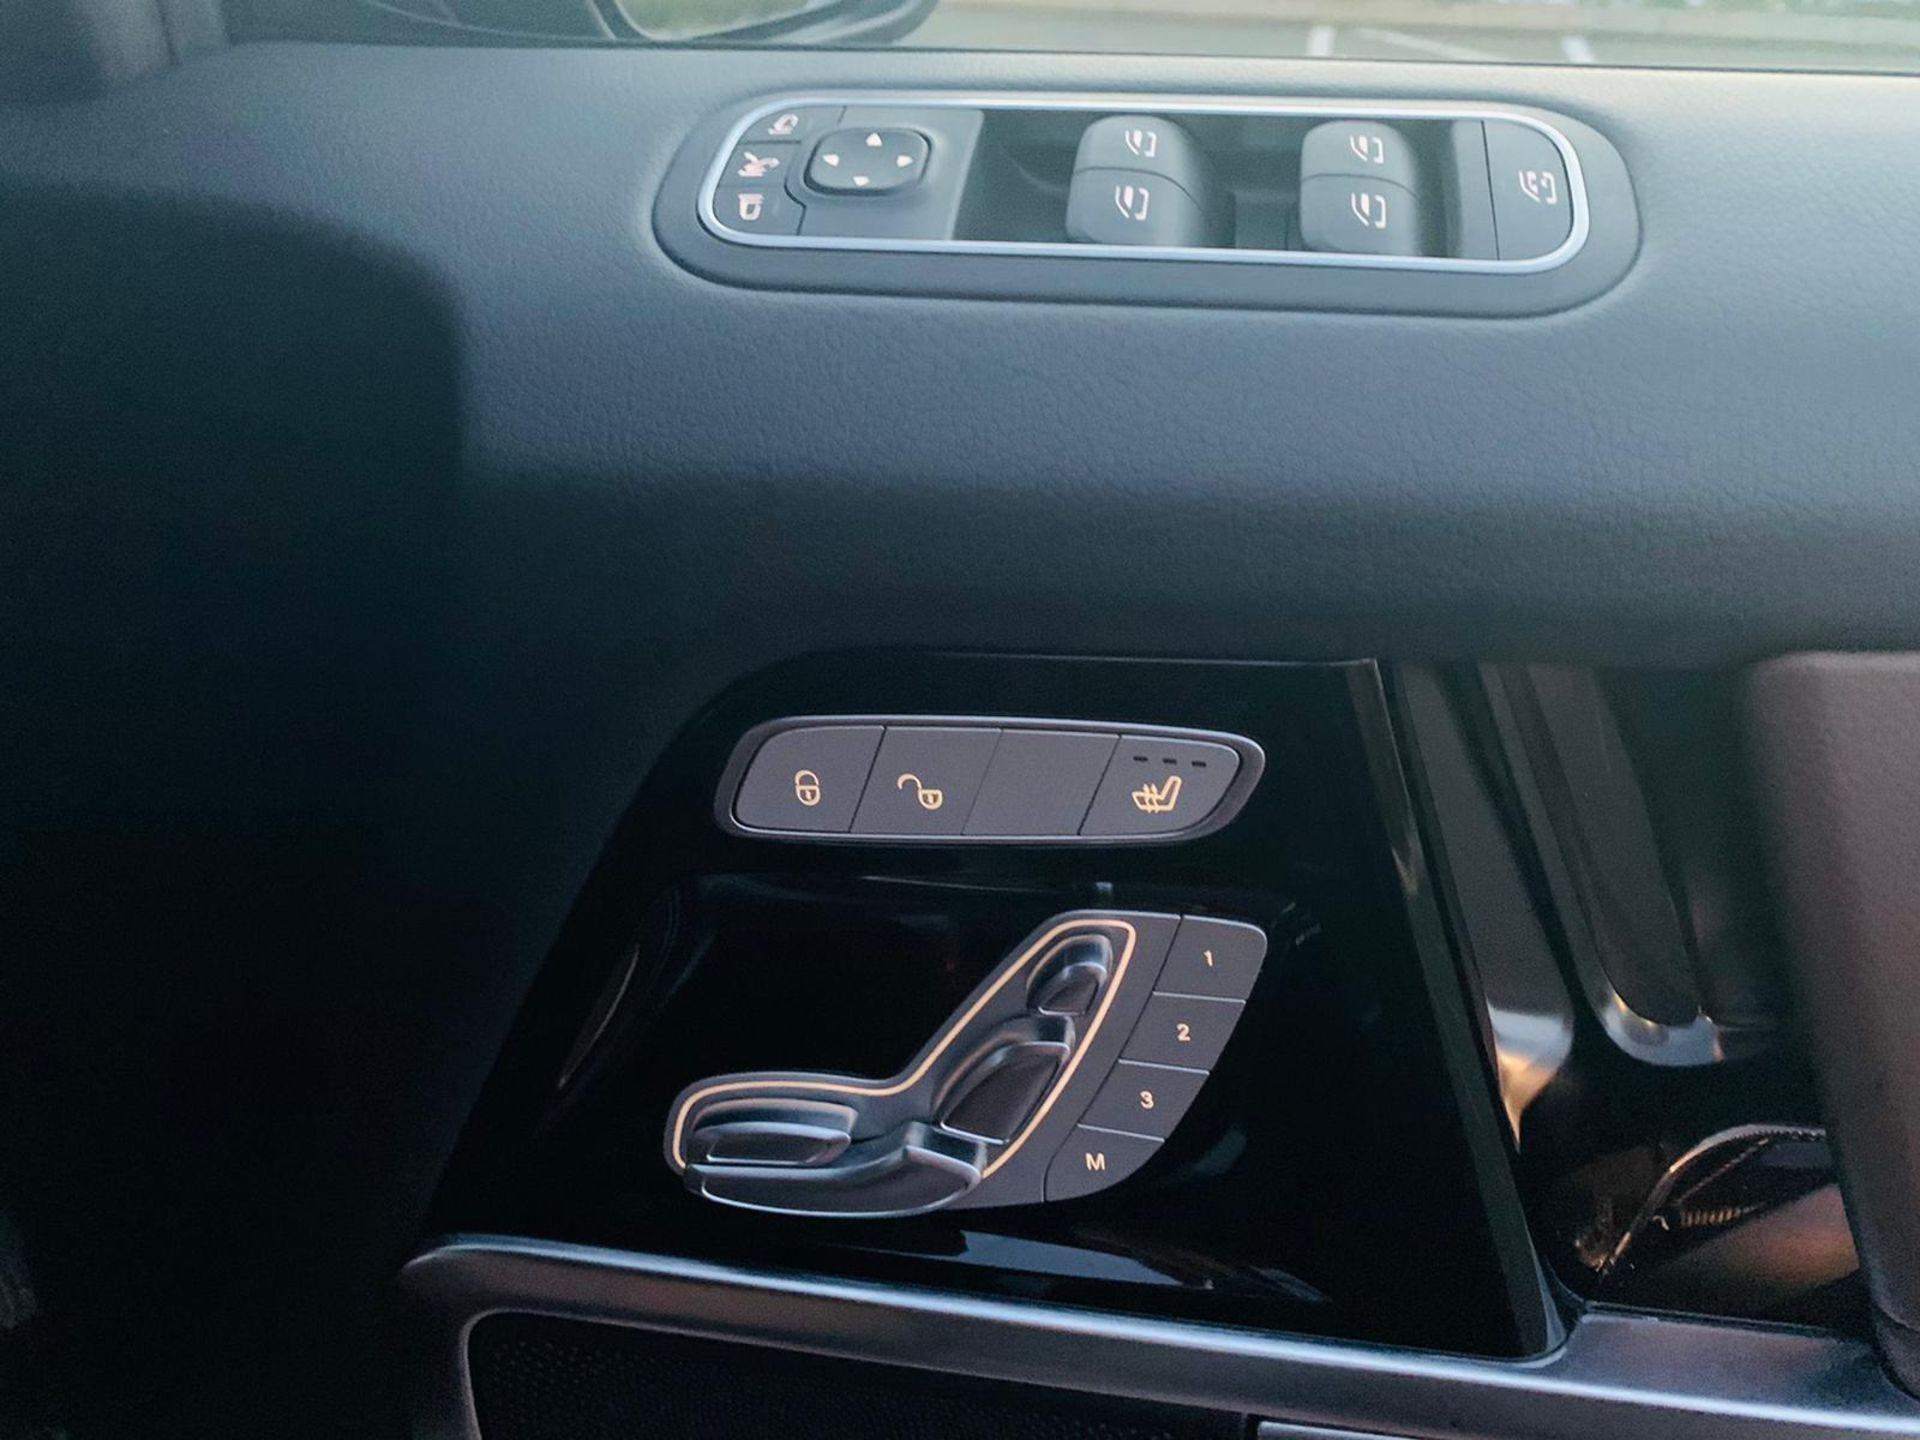 Mercedes G350d AMG LINE 9G-Tronic+ 4Matic 2020 20 Reg - 1 Owner - Only 9k Miles - HUGE SPEC - Image 39 of 41